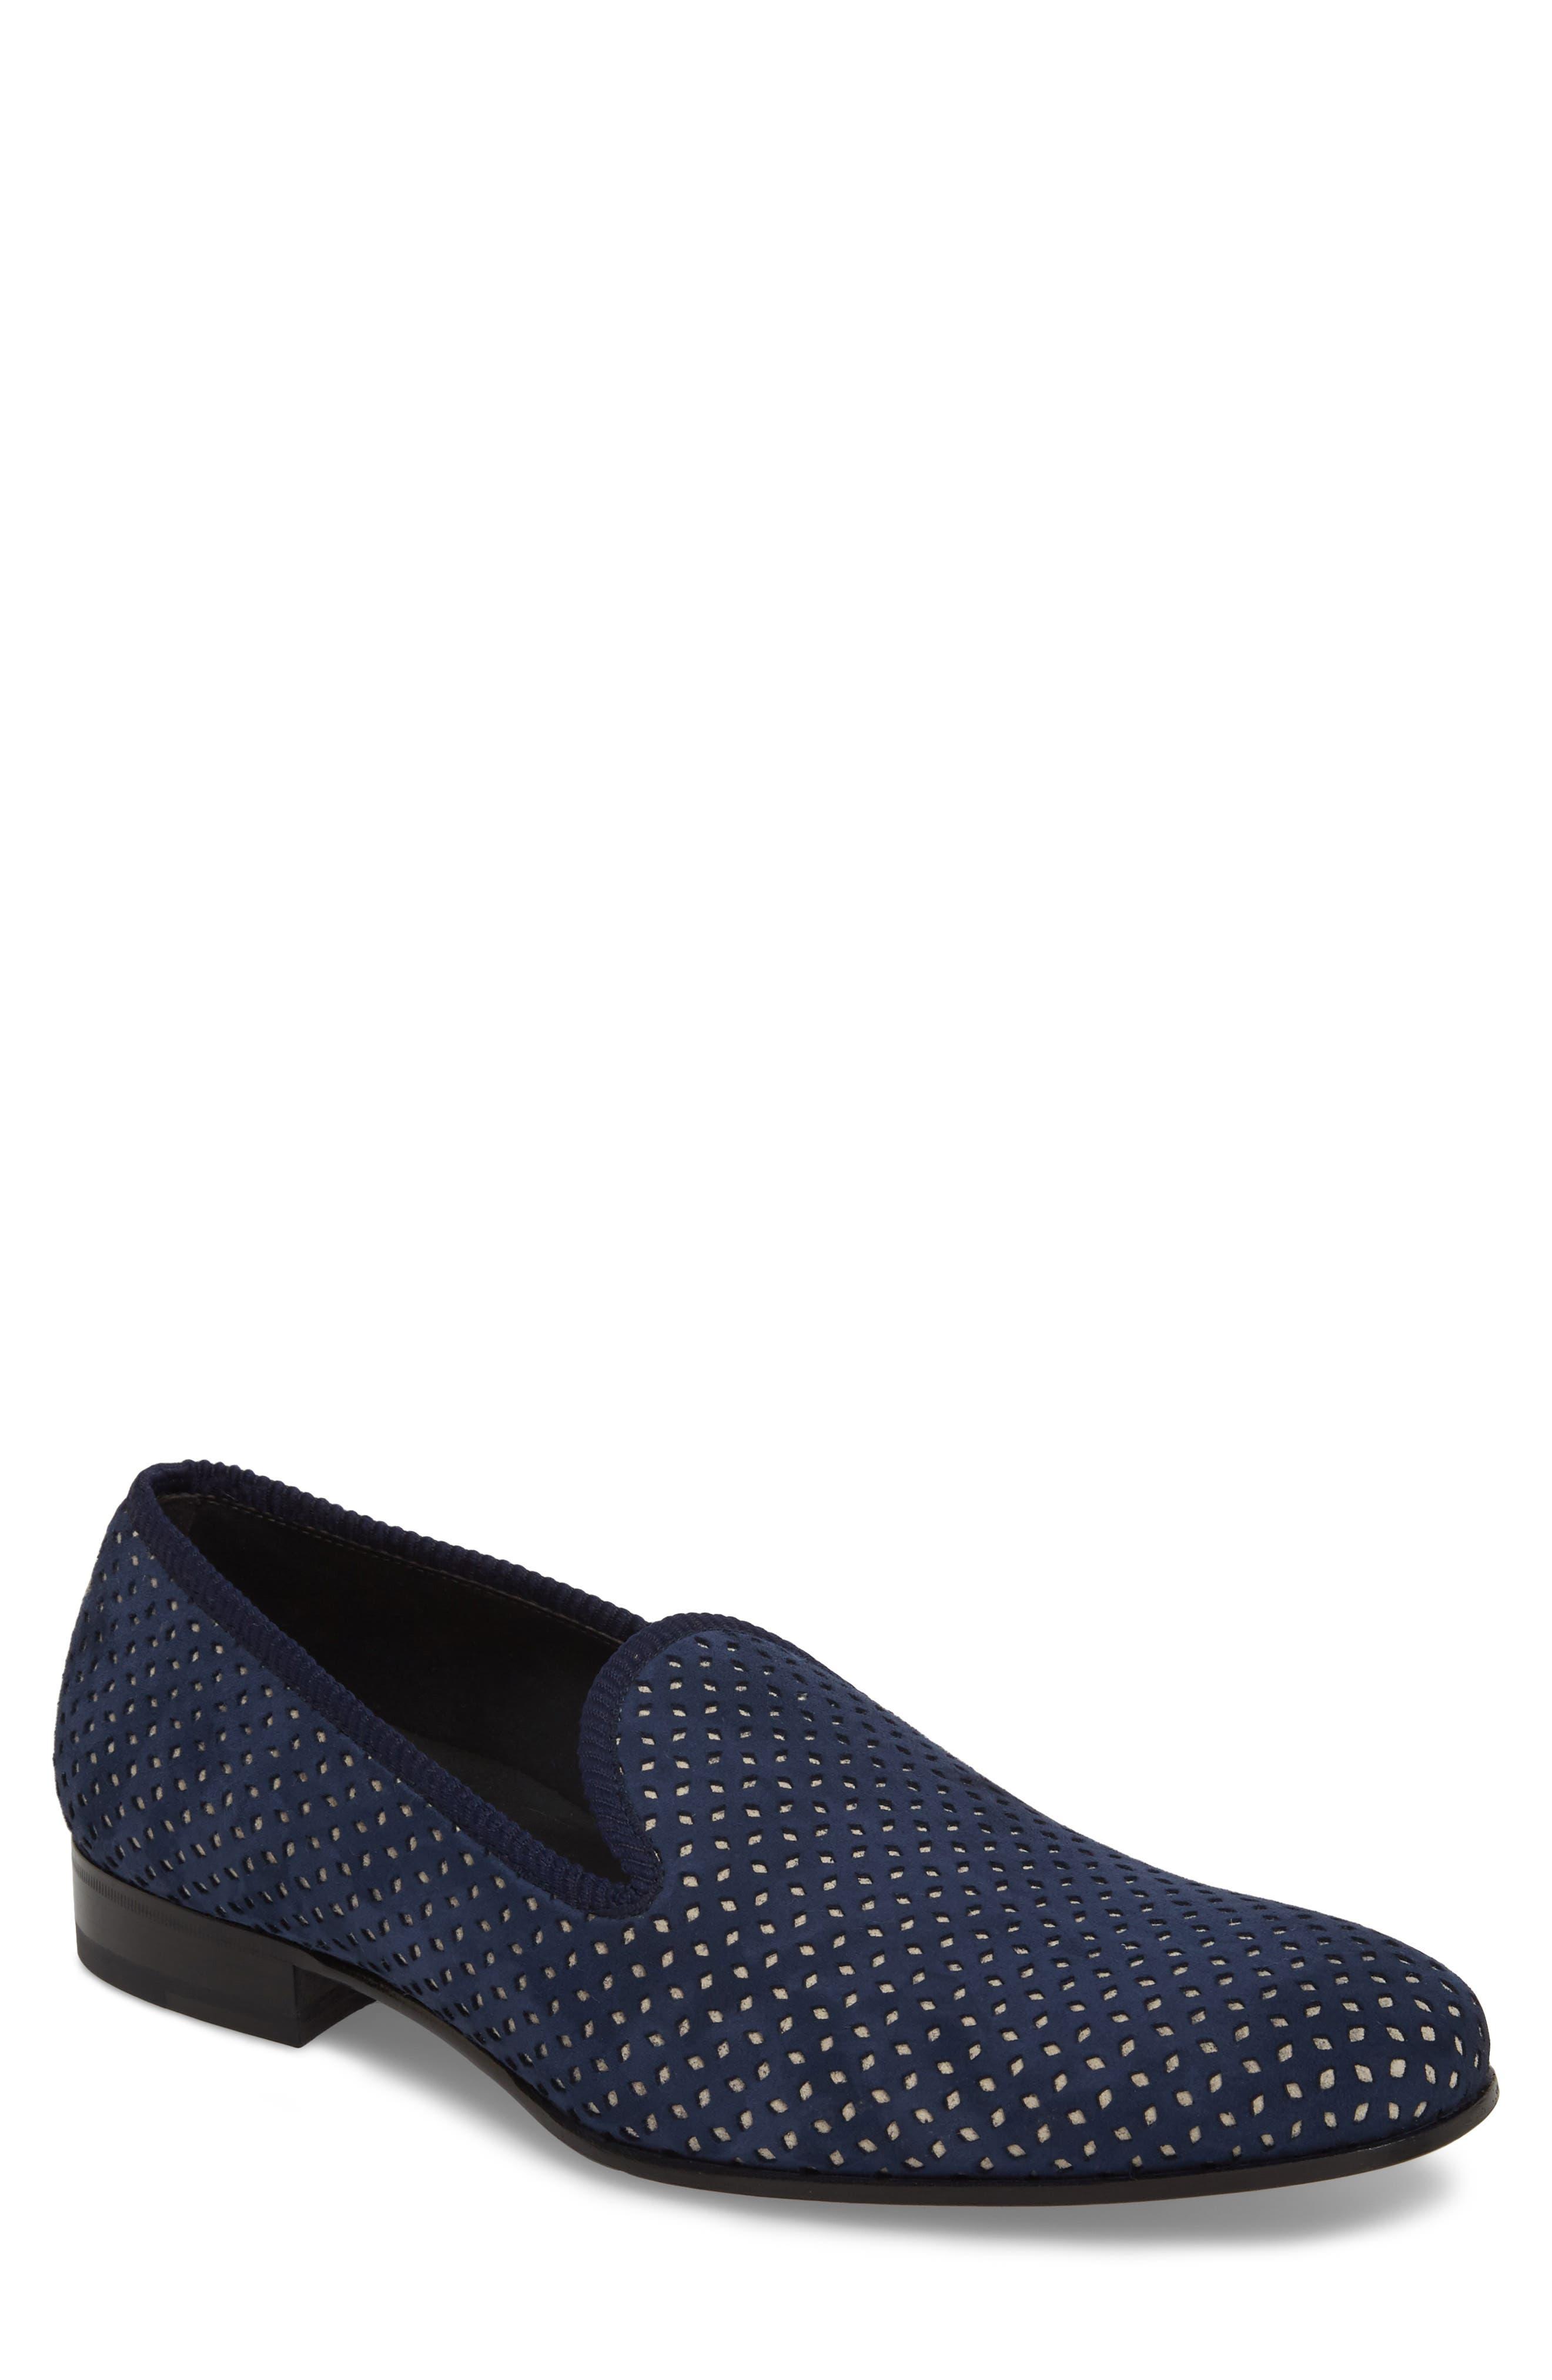 Cibeles Venetian Loafer,                         Main,                         color, Blue/ Bone Suede